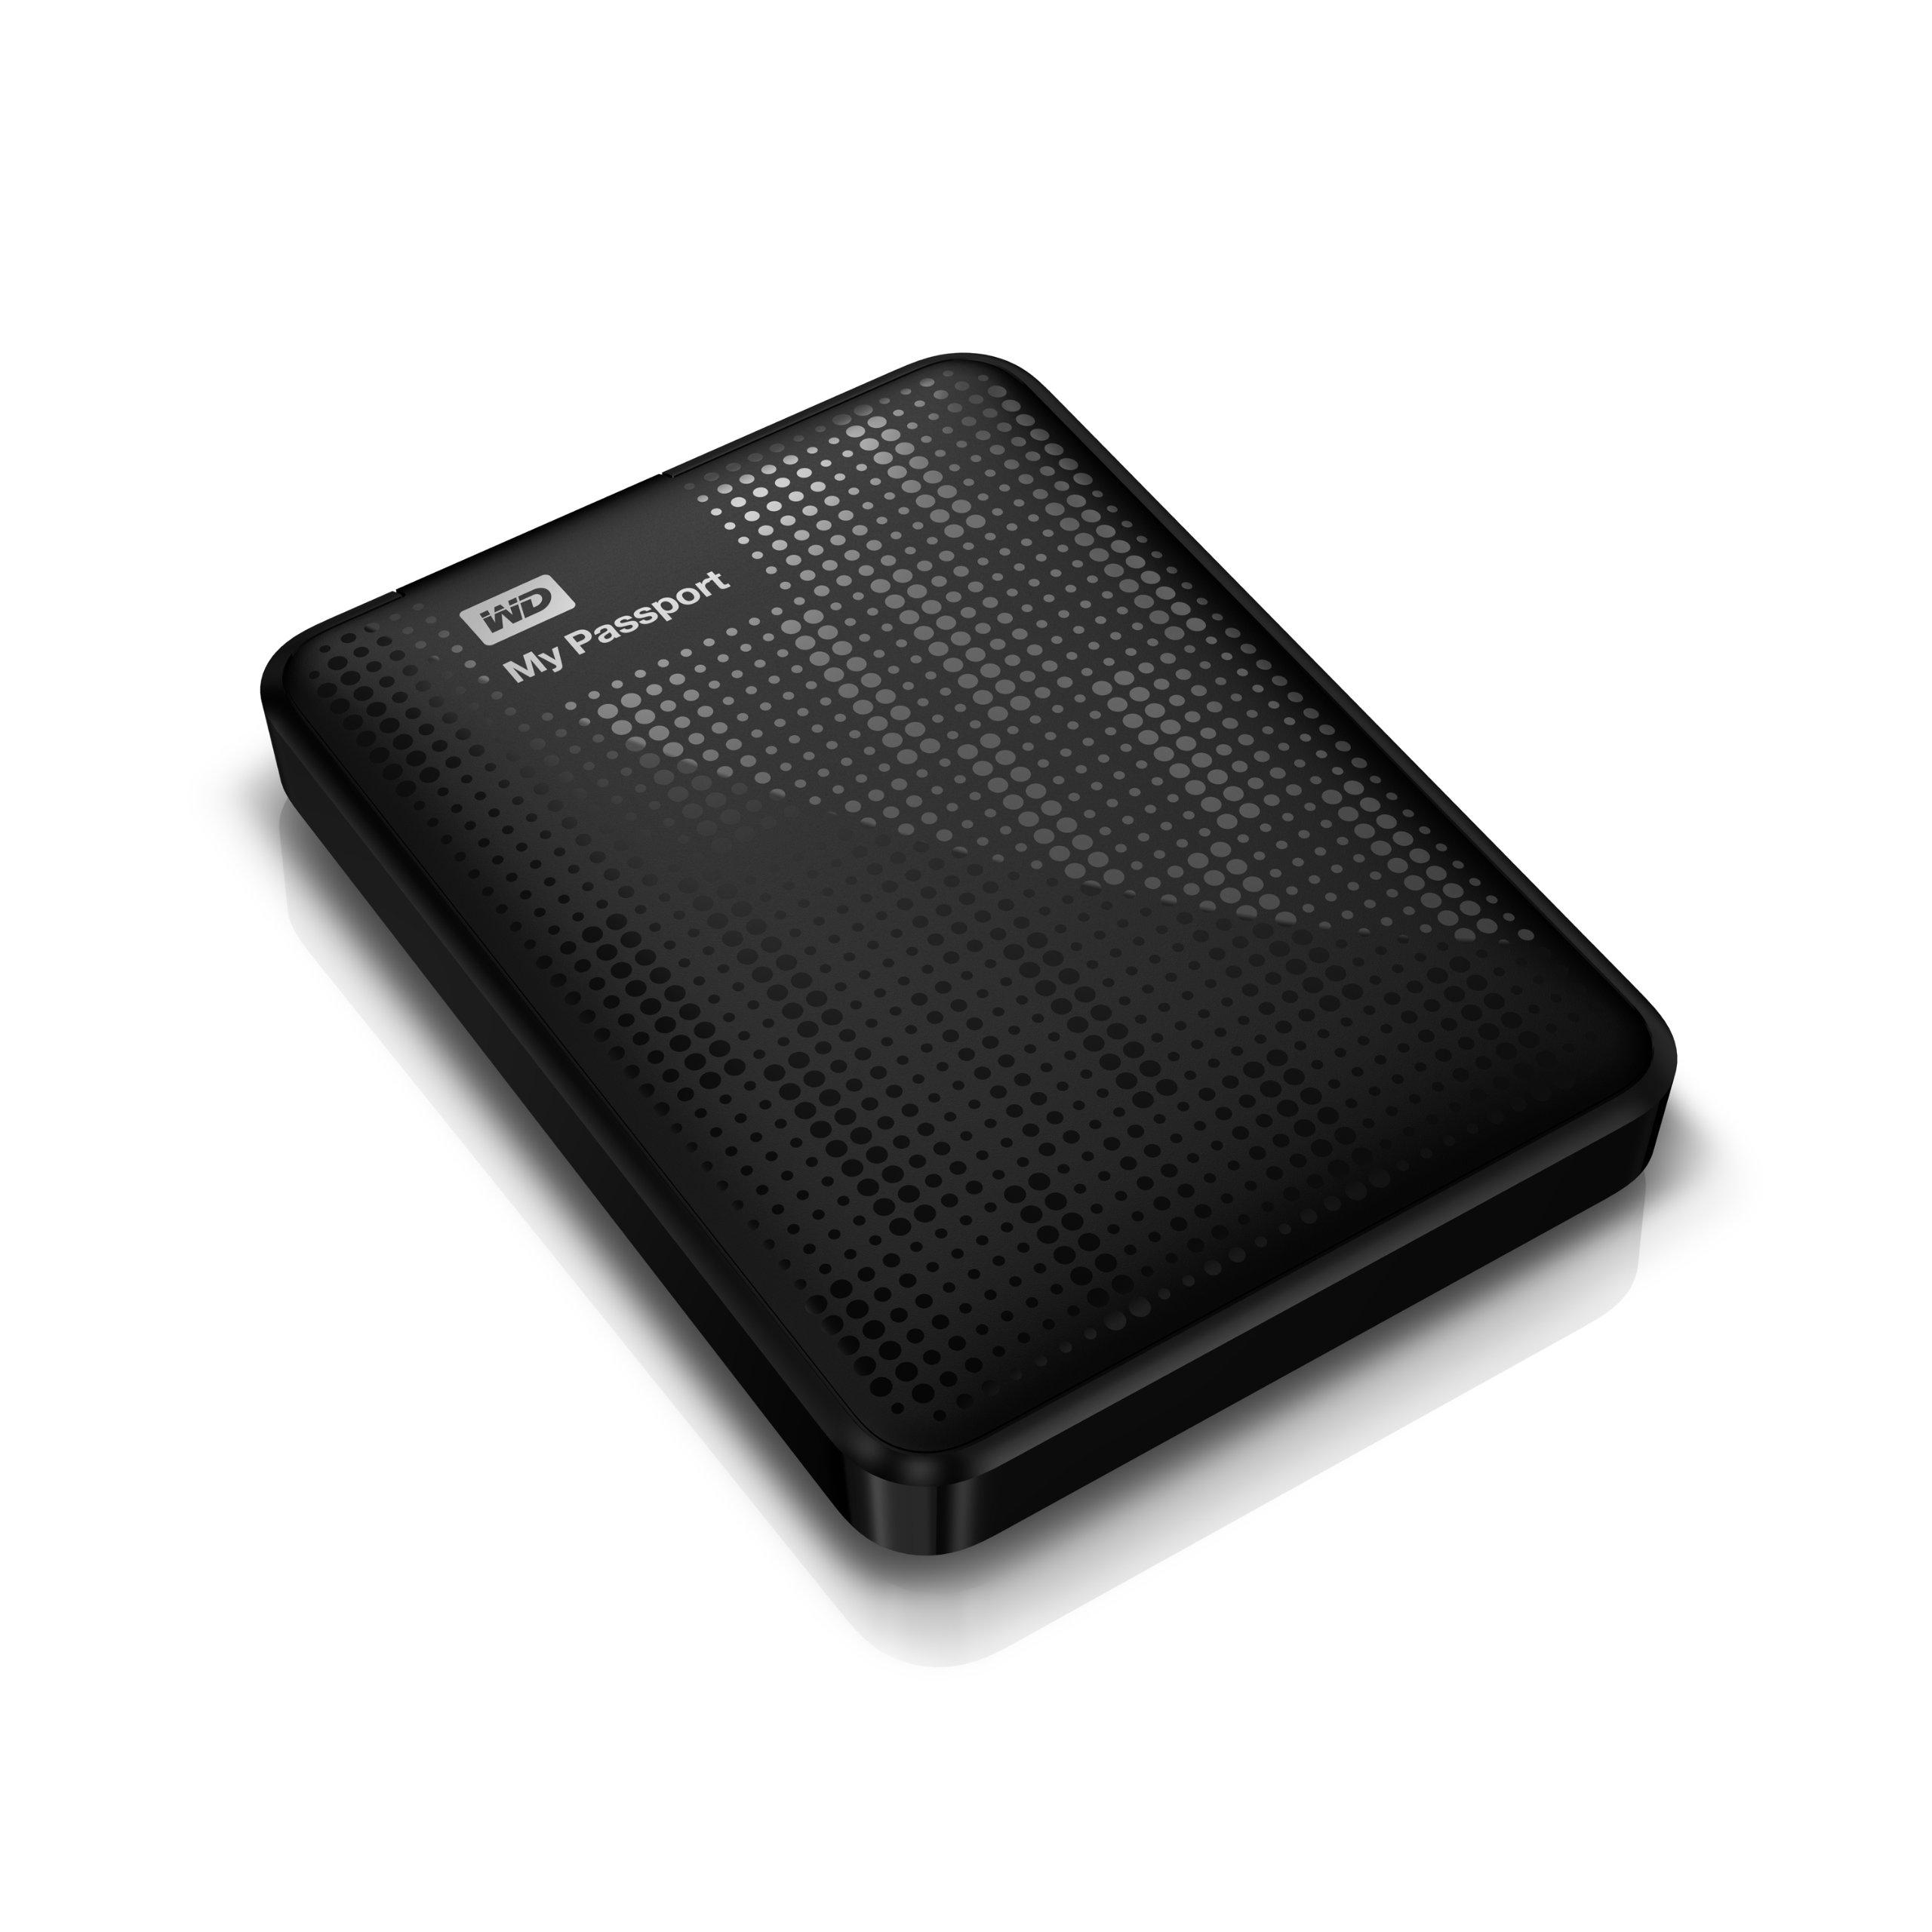 WD My Passport 1TB USB 3.0 Portable External Hard Drive (Black) product image